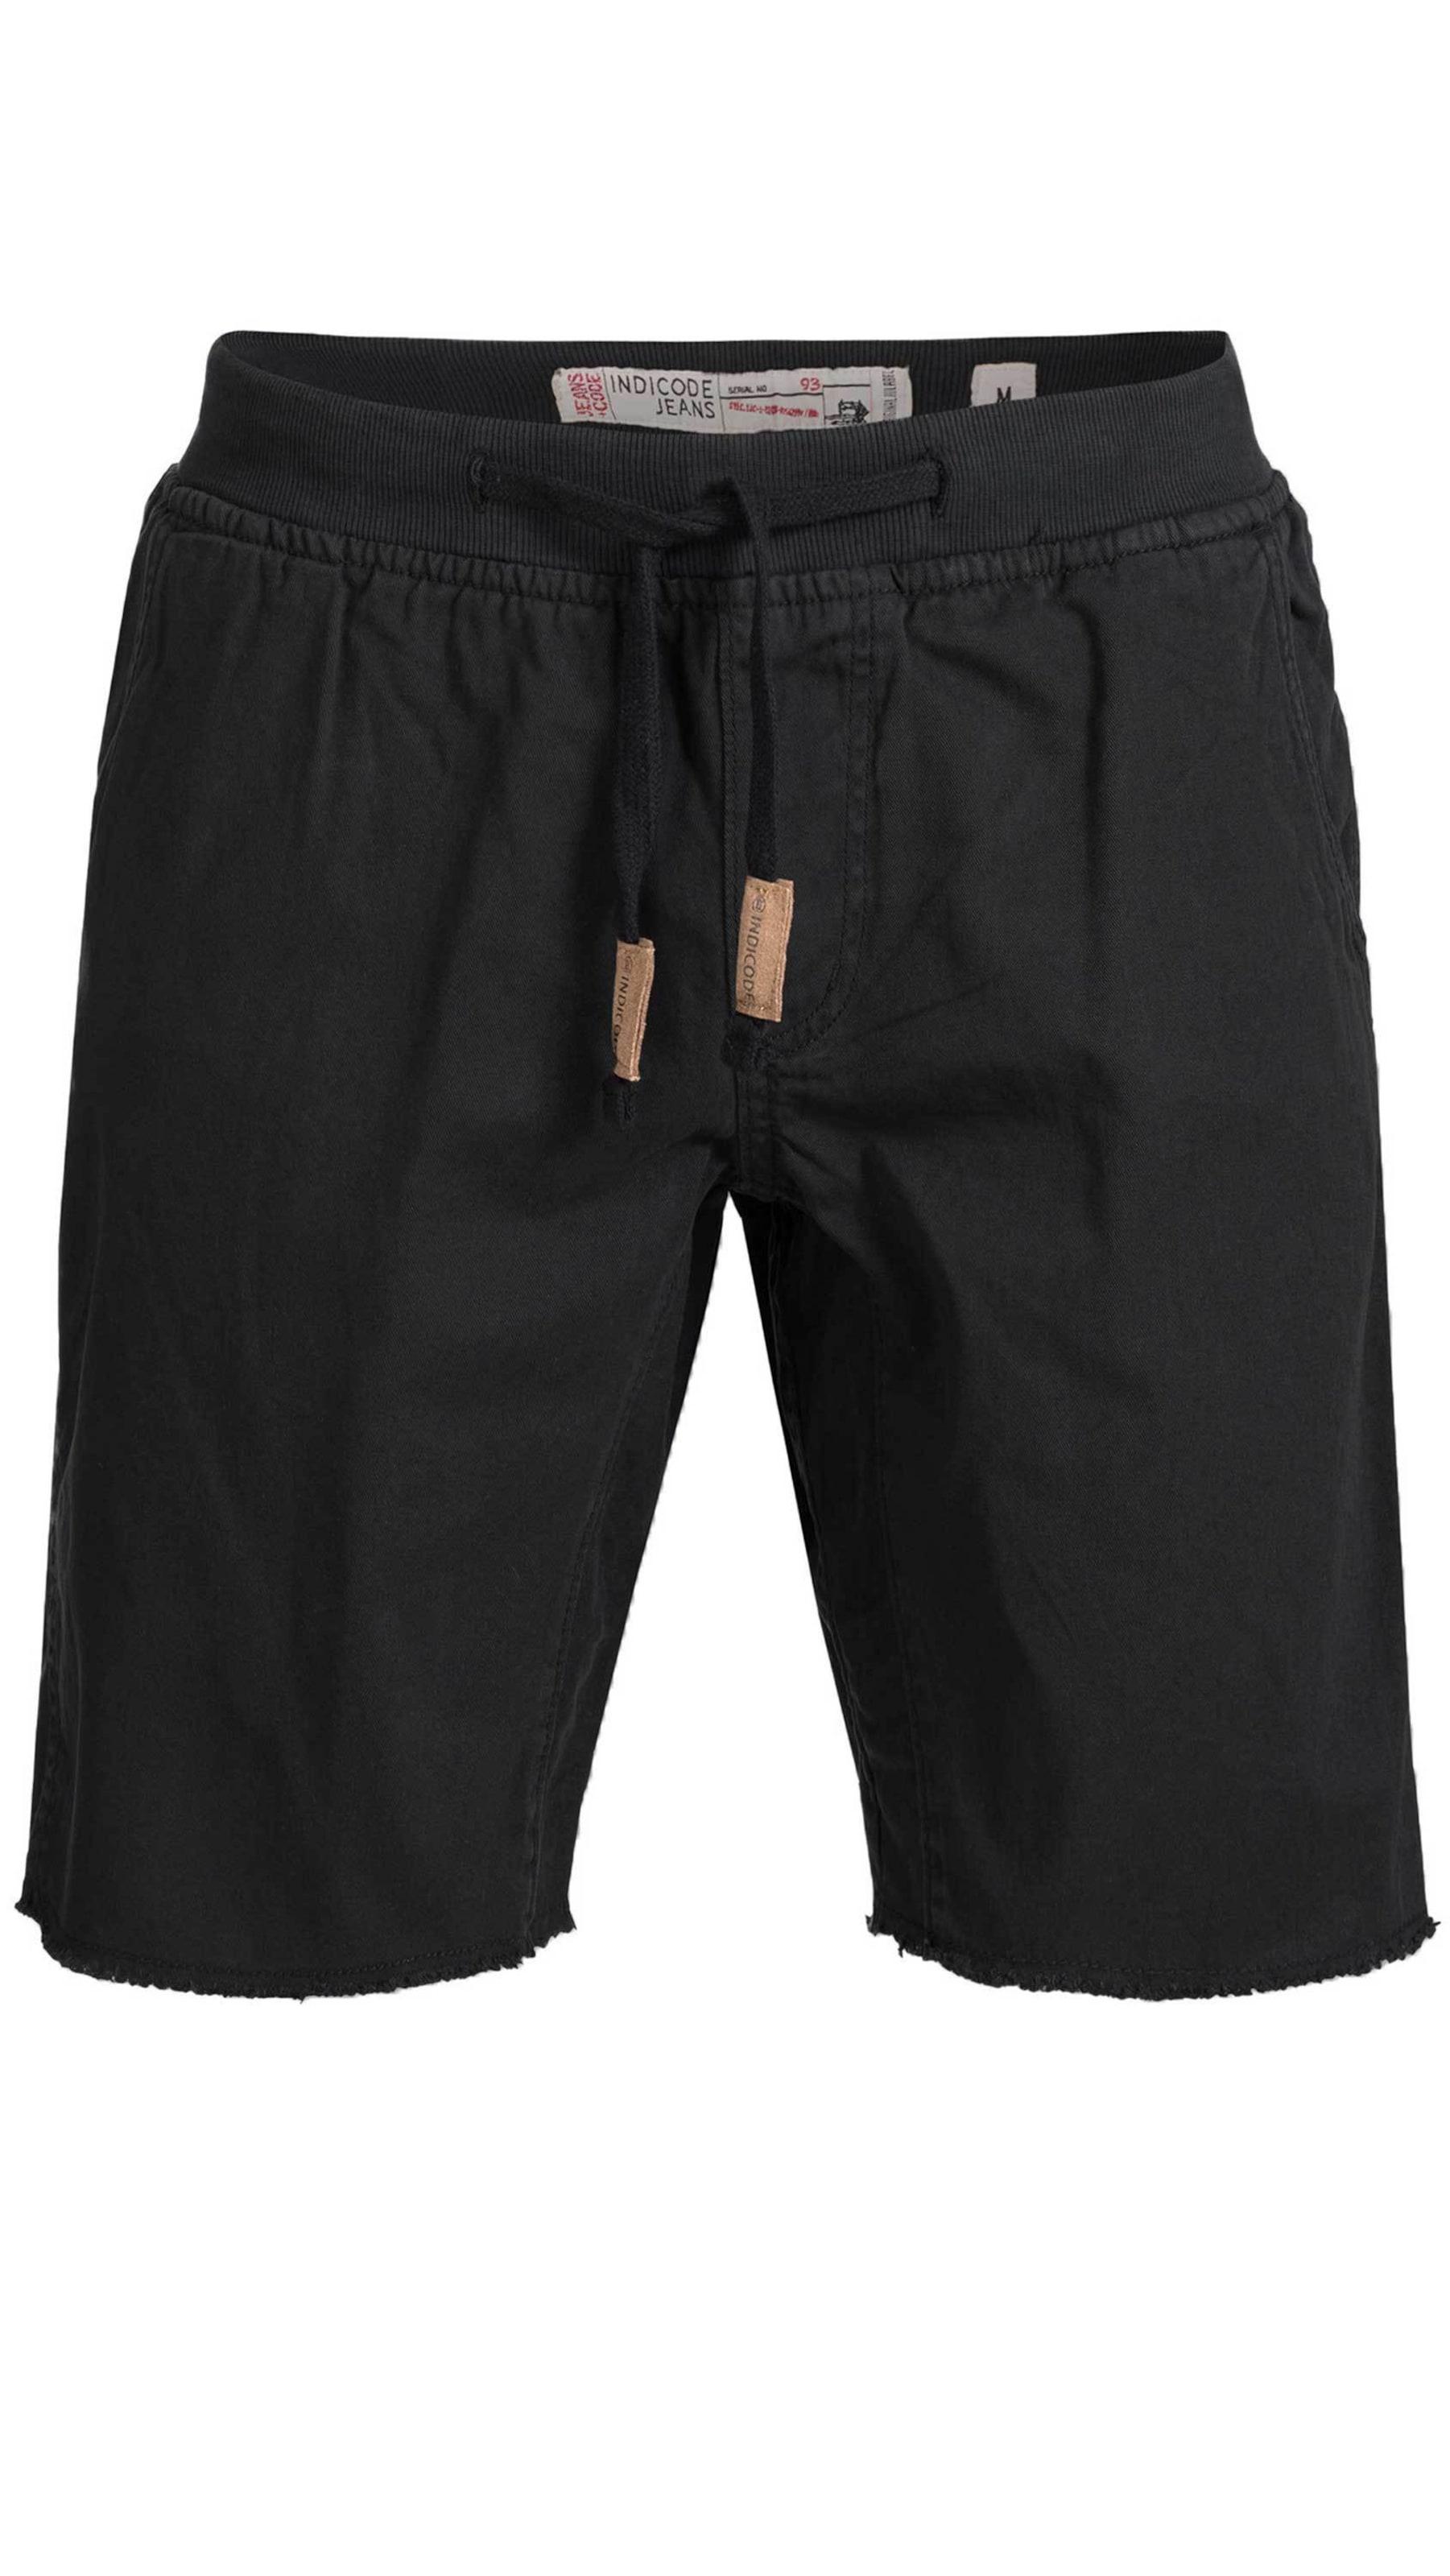 En Noir Jeans Chino Indicode Pantalon 'carver' 0N8nvwm